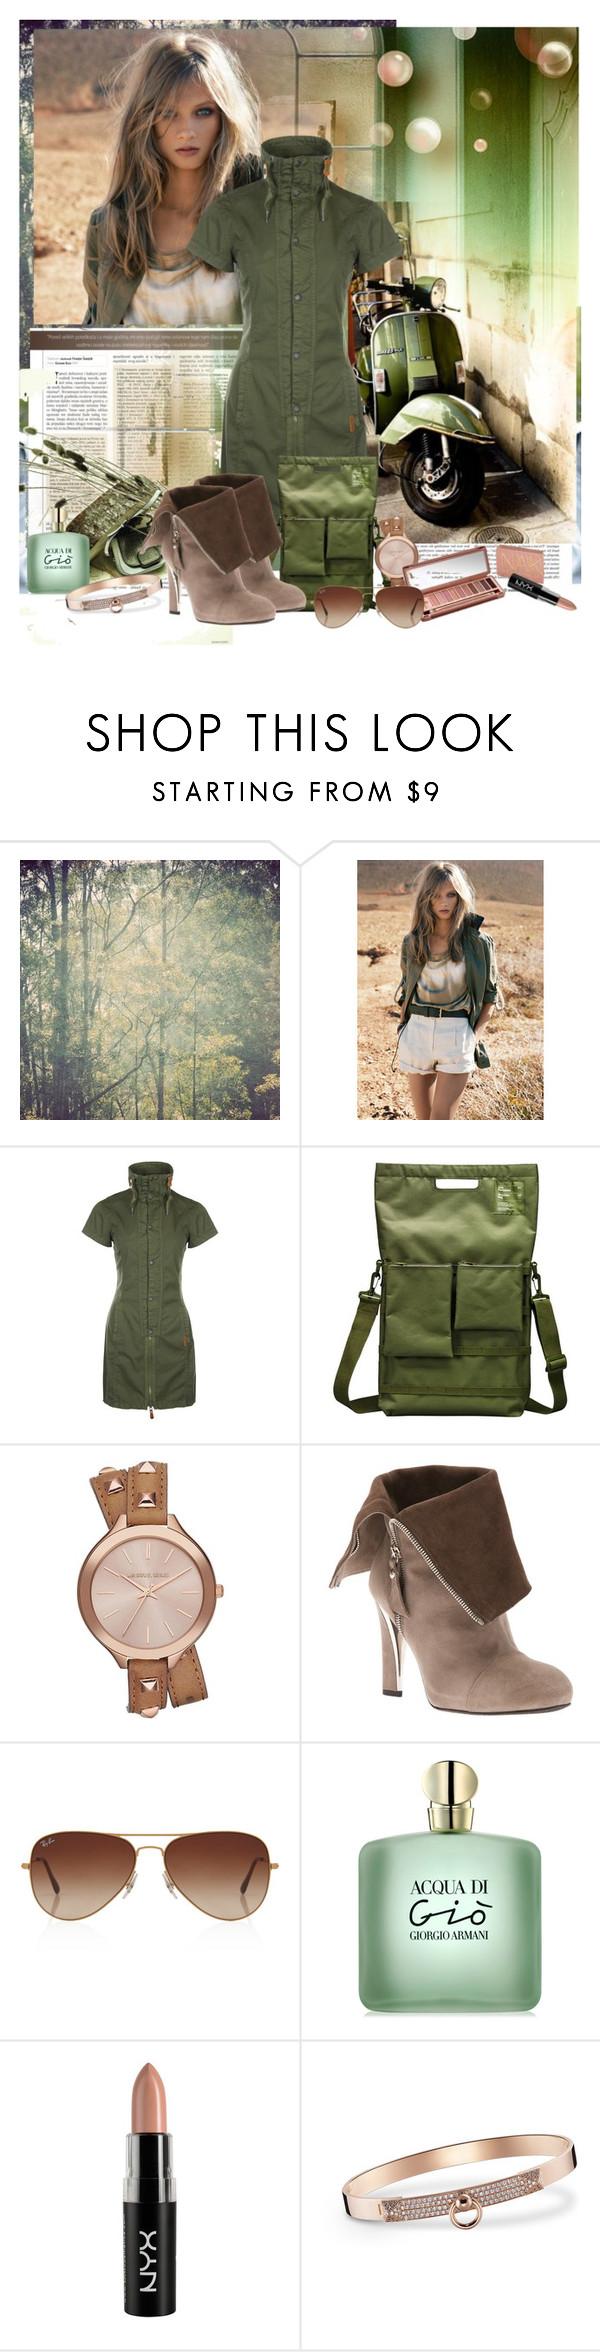 """green"" by biljana-miric-ex-tomic ❤ liked on Polyvore featuring MANGO, Wildfang, Bench, Unit Portables, Michael Kors, Stuart Weitzman, Urban Decay, Rayban, Giorgio Armani and NYX"